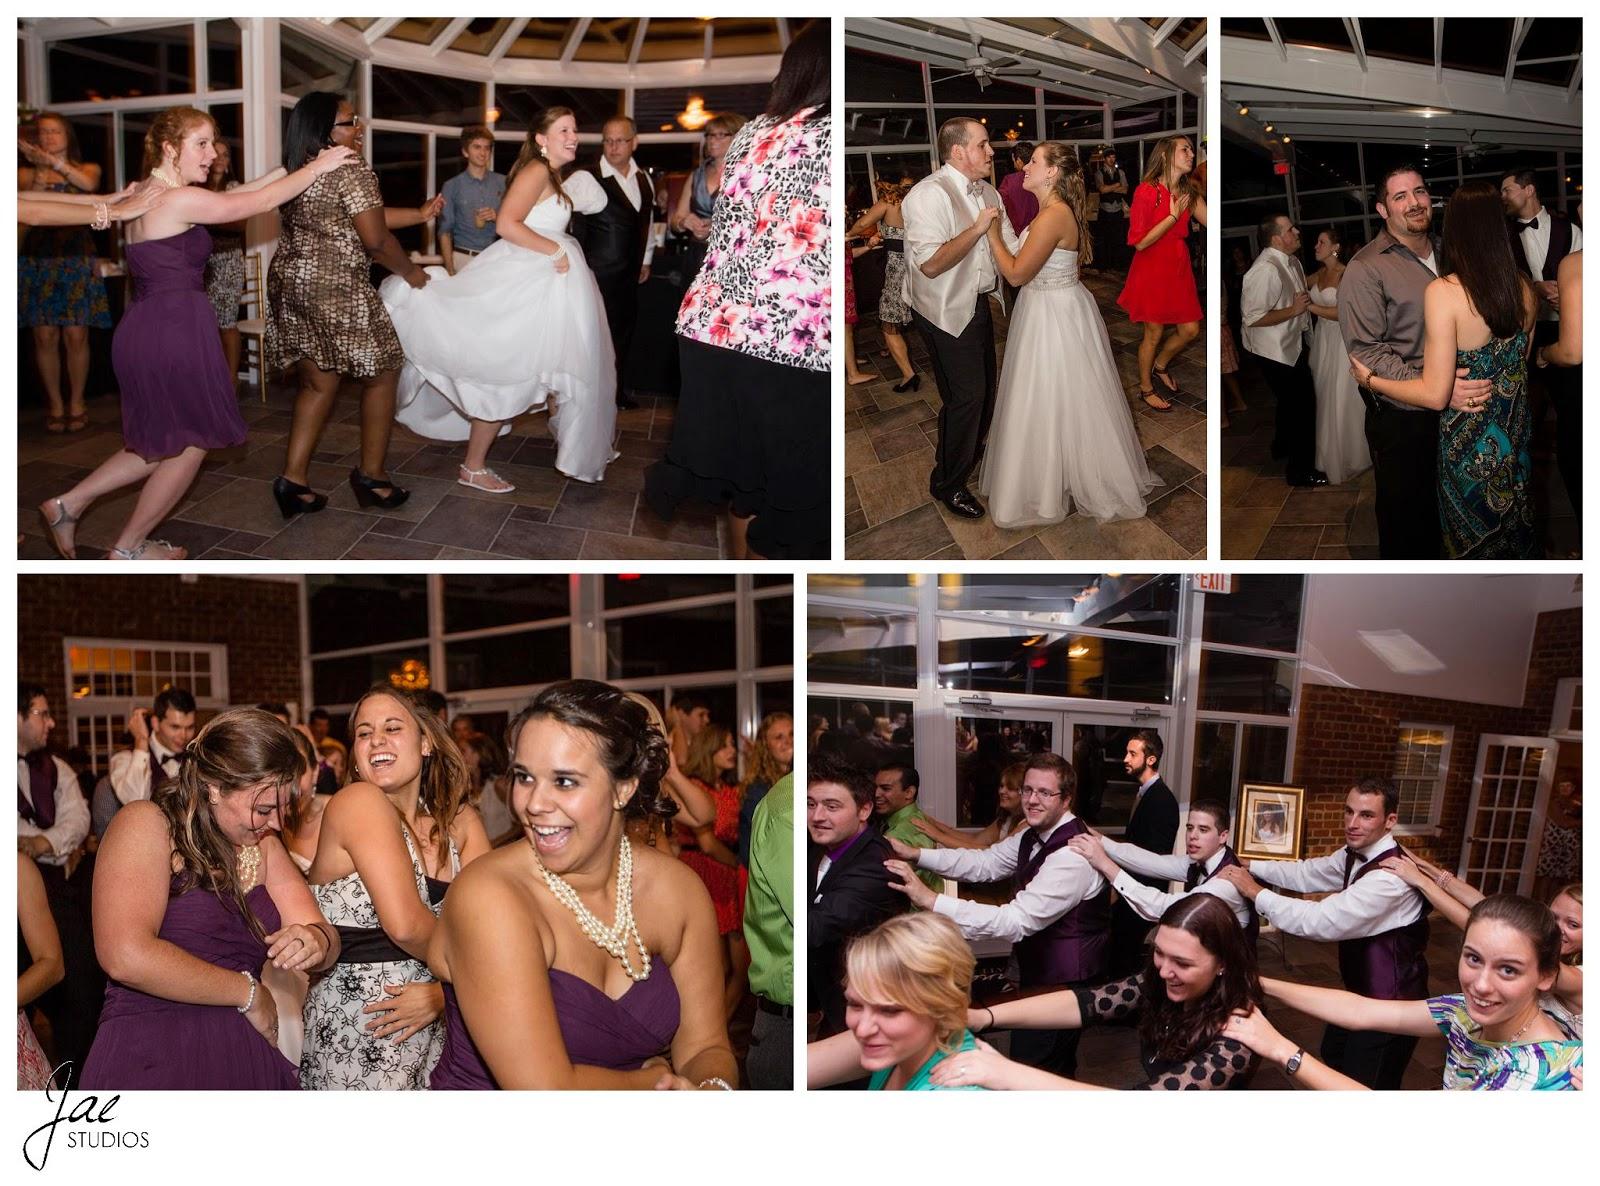 Jonathan and Julie, Bird cage, West Manor Estate, Wedding, Lynchburg, Virginia, Jae Studios, bridesmaids, wedding dress, bride, groom, guests, dancing, reception